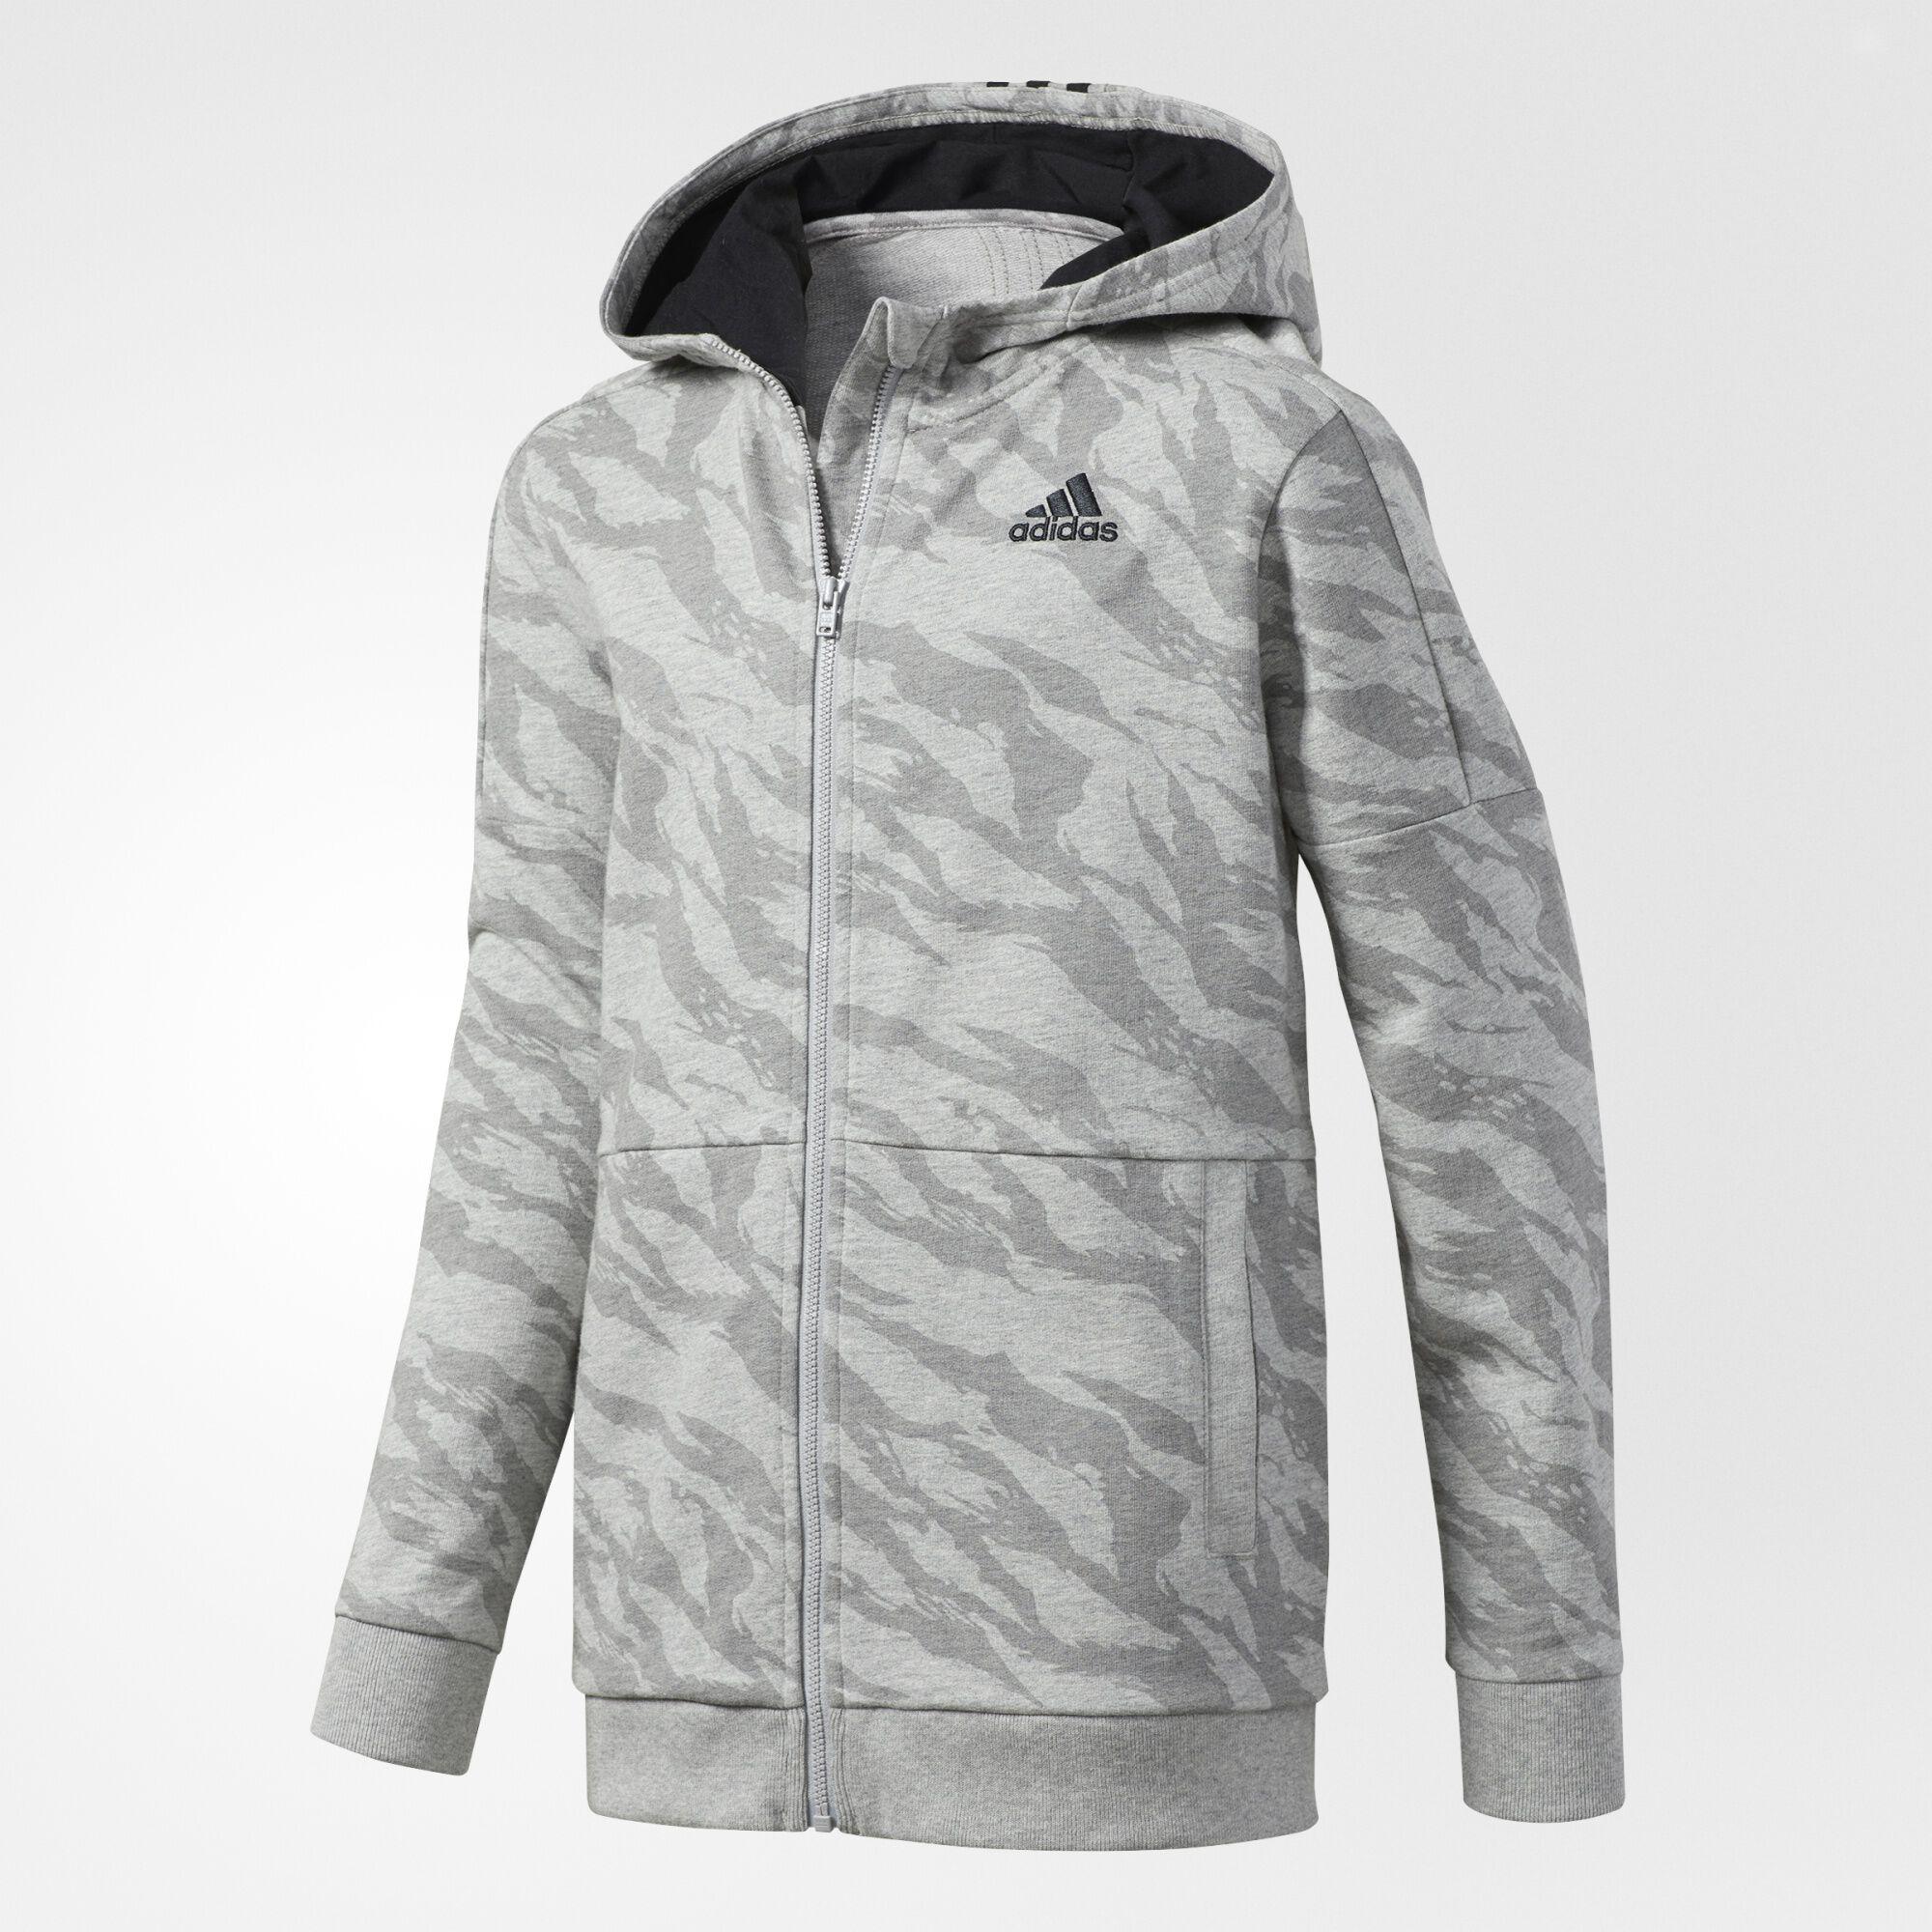 Buy adidas jacket kids   OFF33% Discounted e02b0a615deac